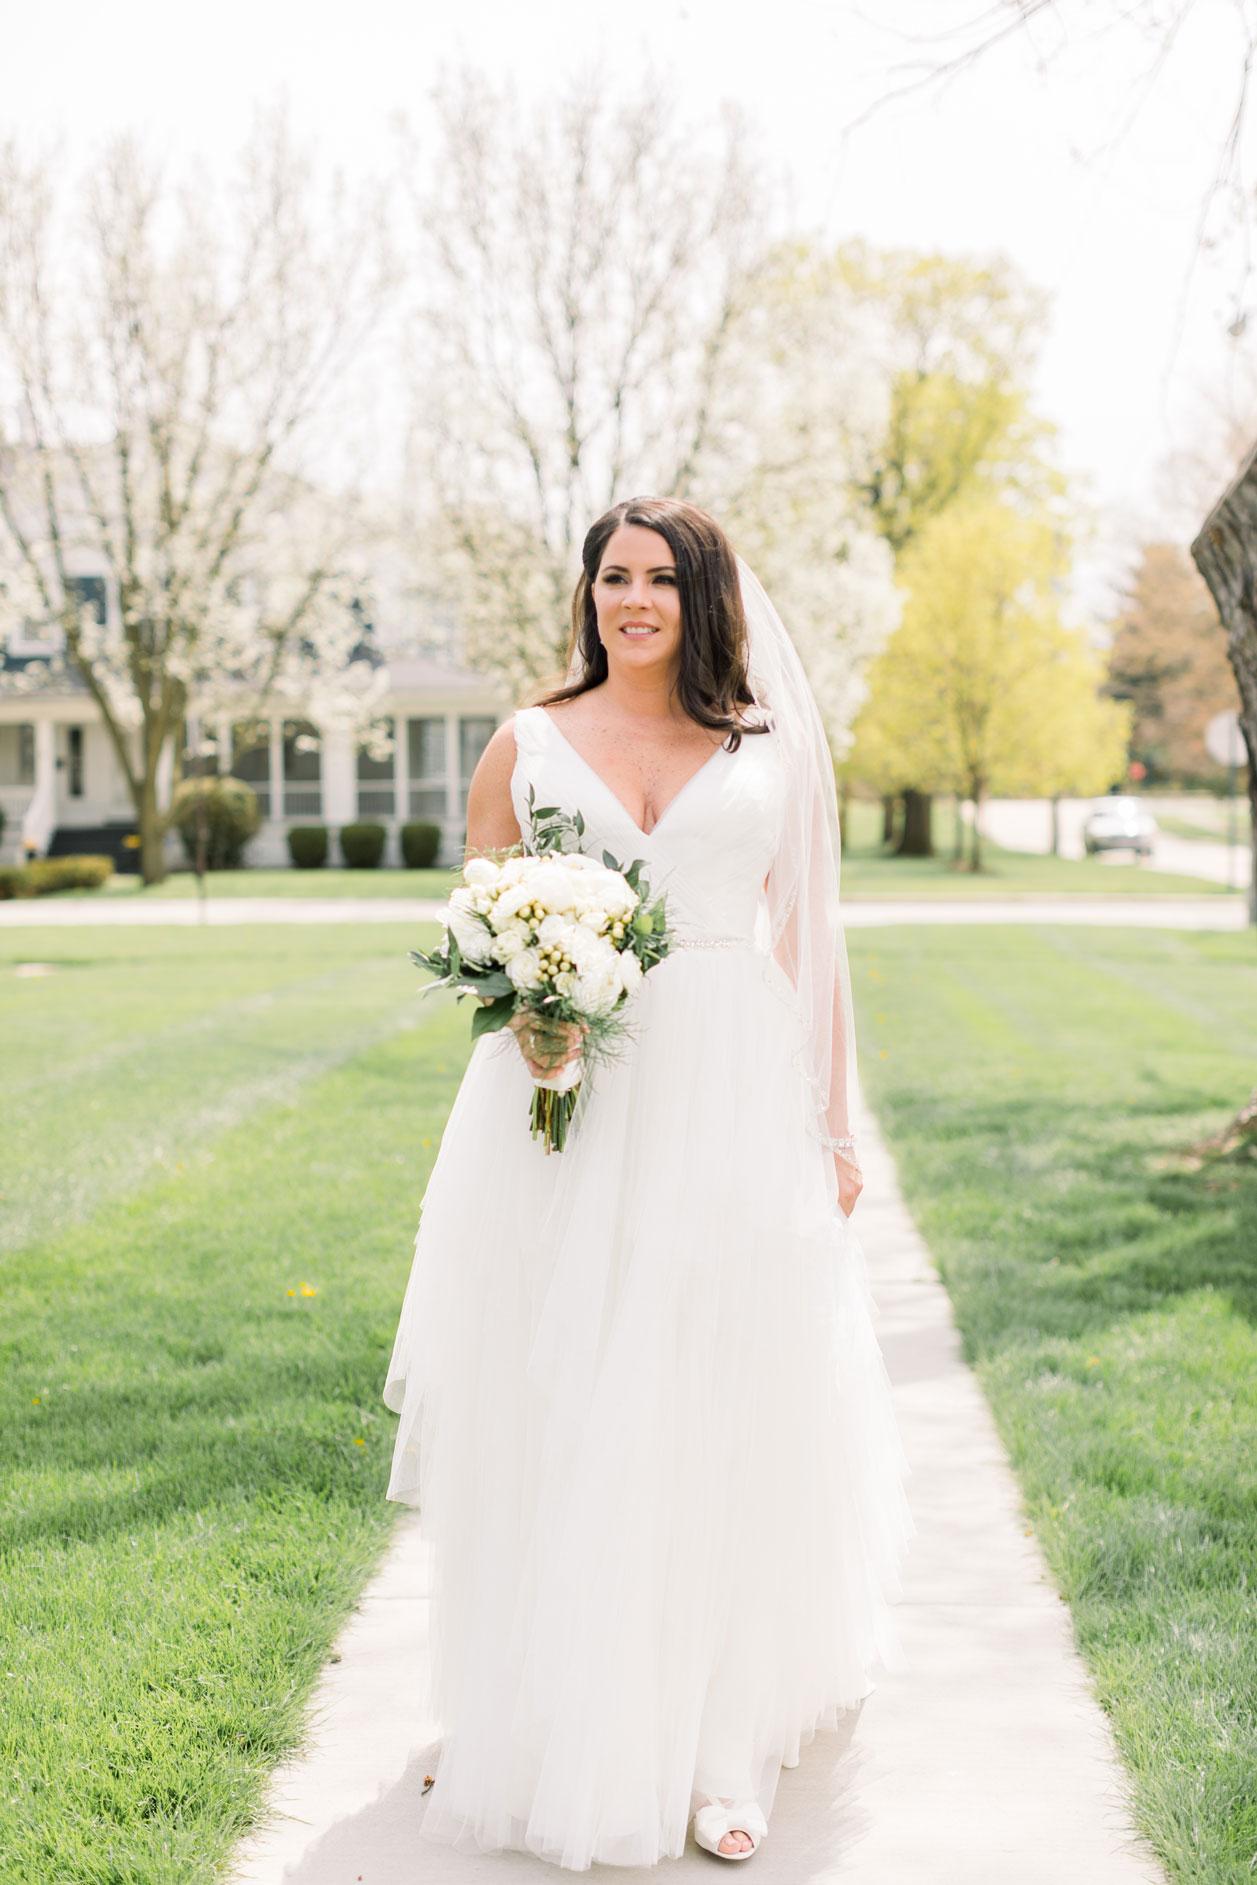 Konz-Bigaila-wedding-2017-26.jpg